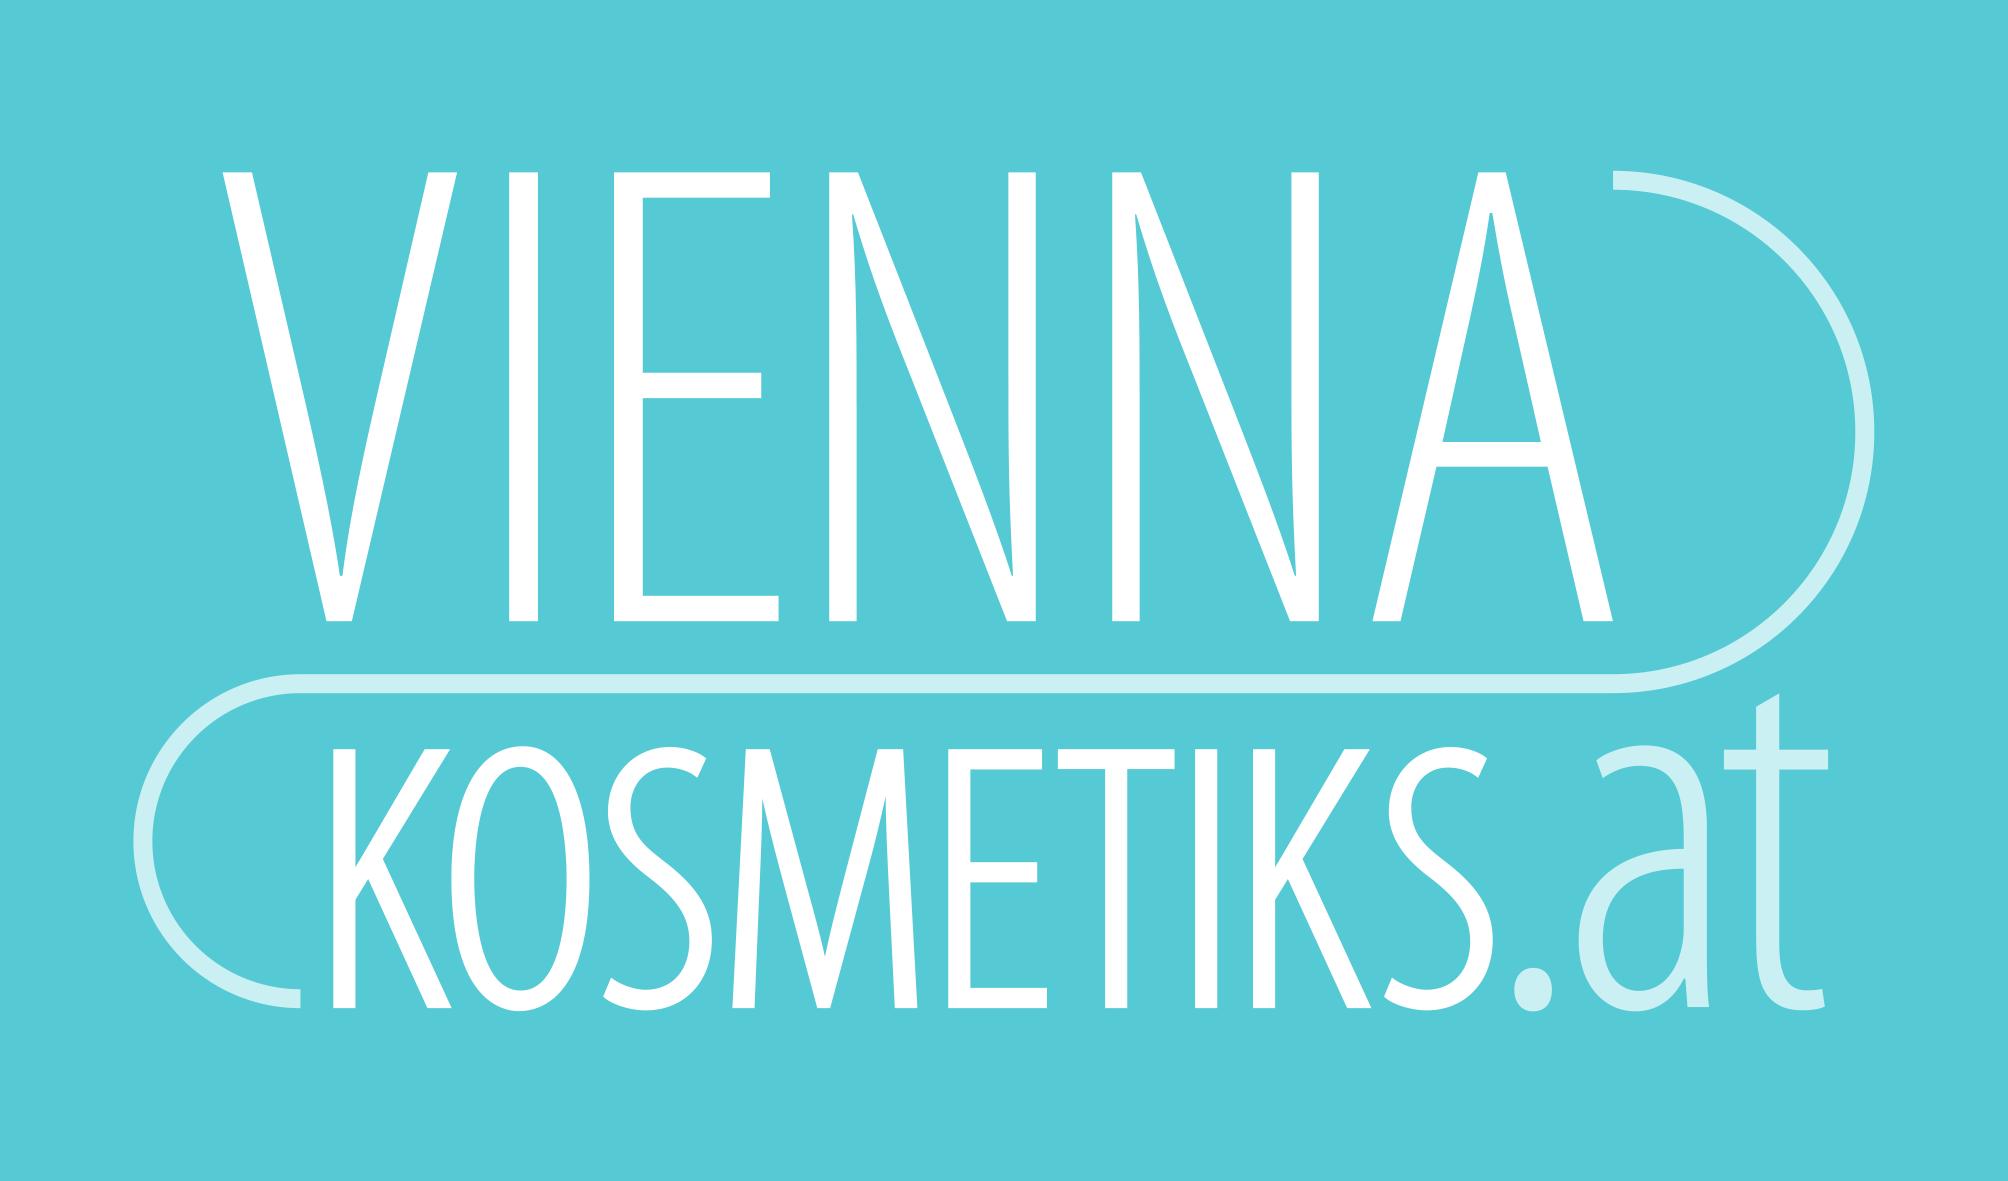 Viennakosmetiks.at